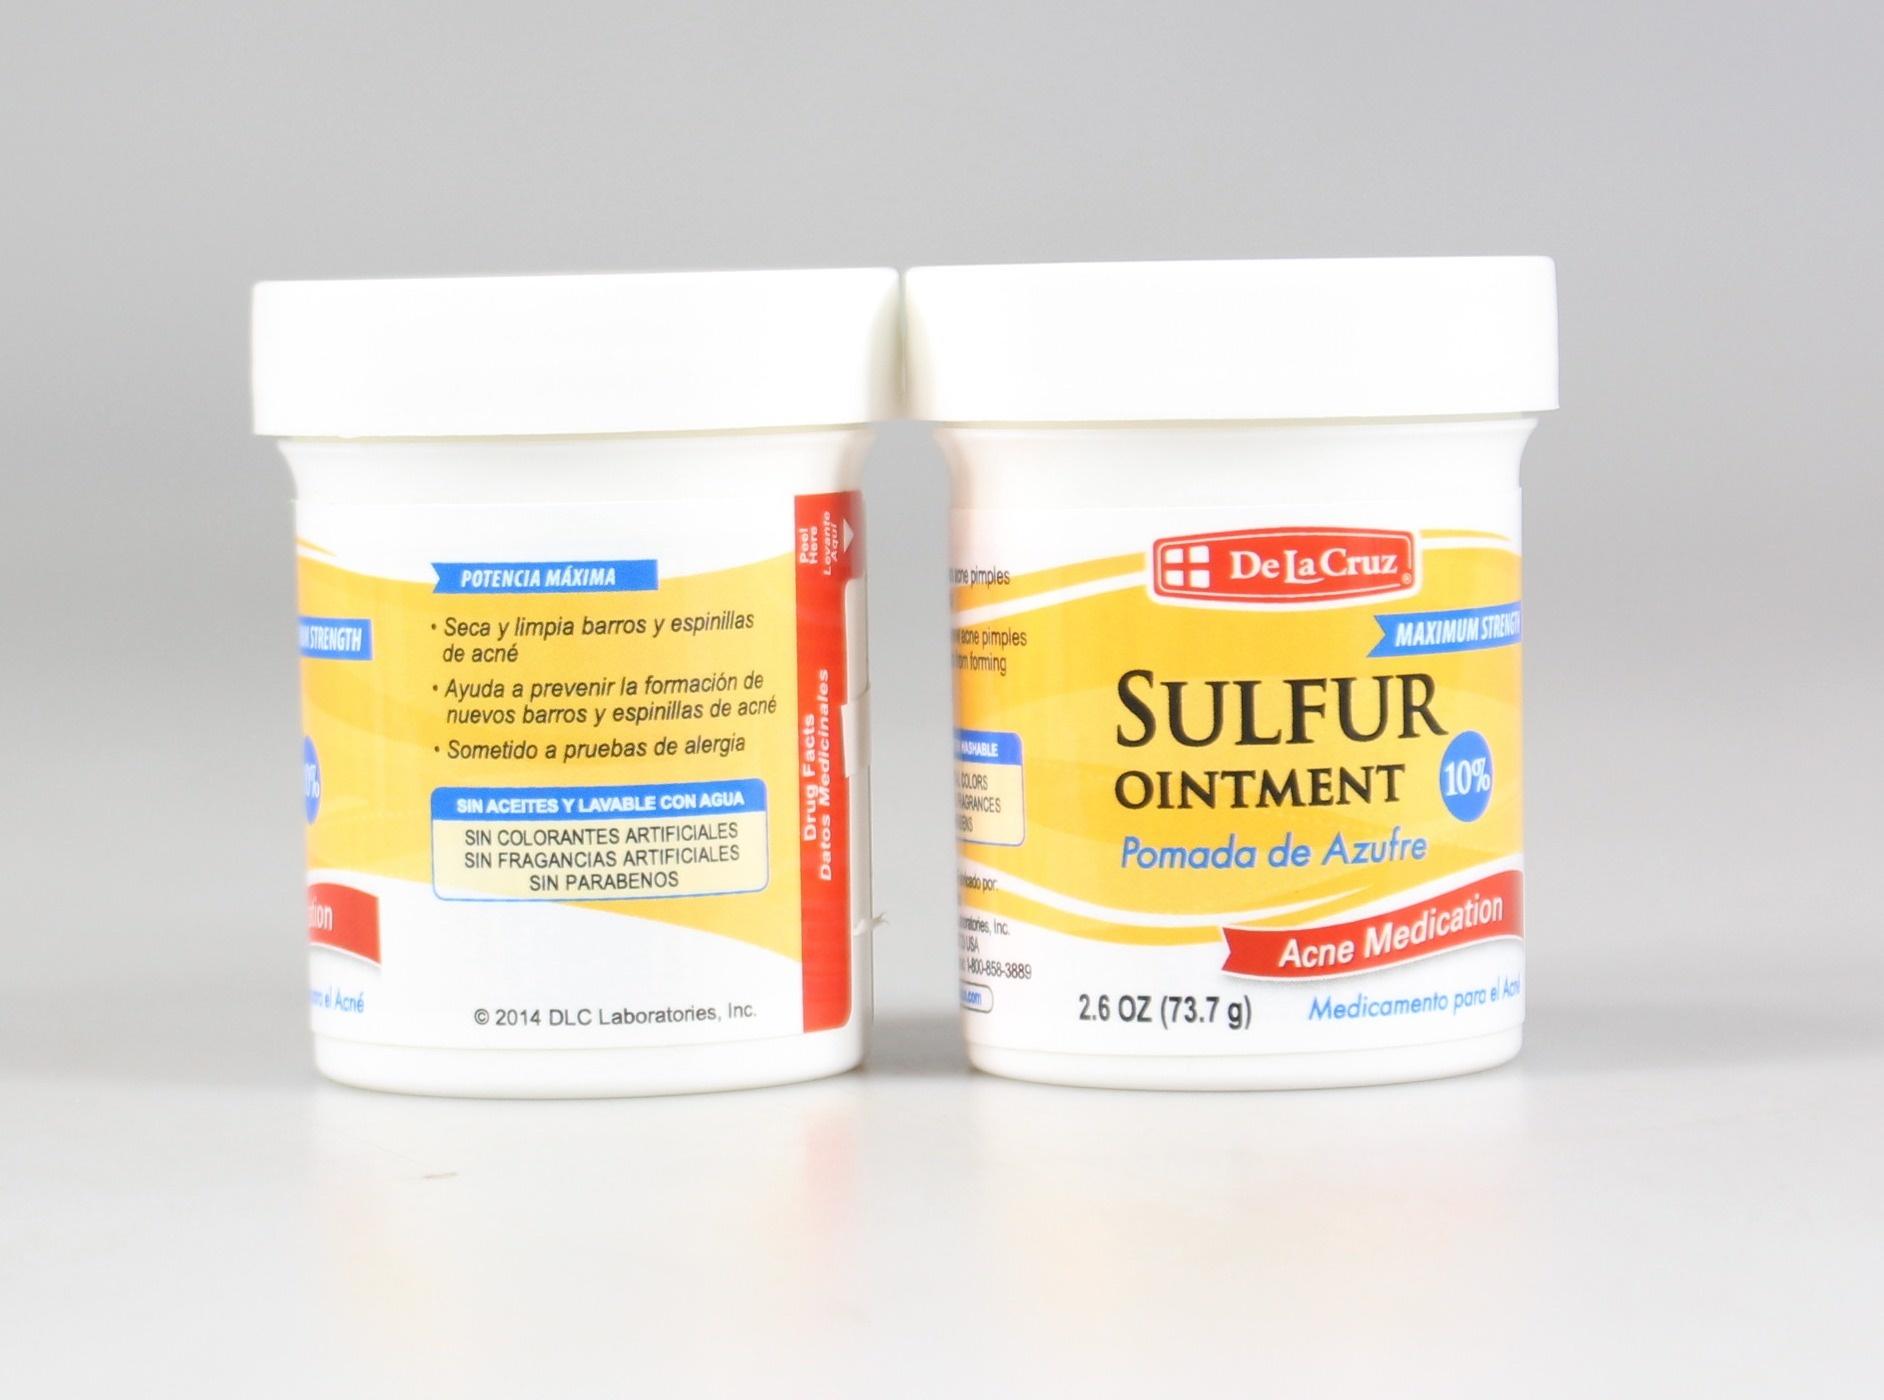 De La Cruz Sulphur Ointment Acne Medication 80ml Lot of 2